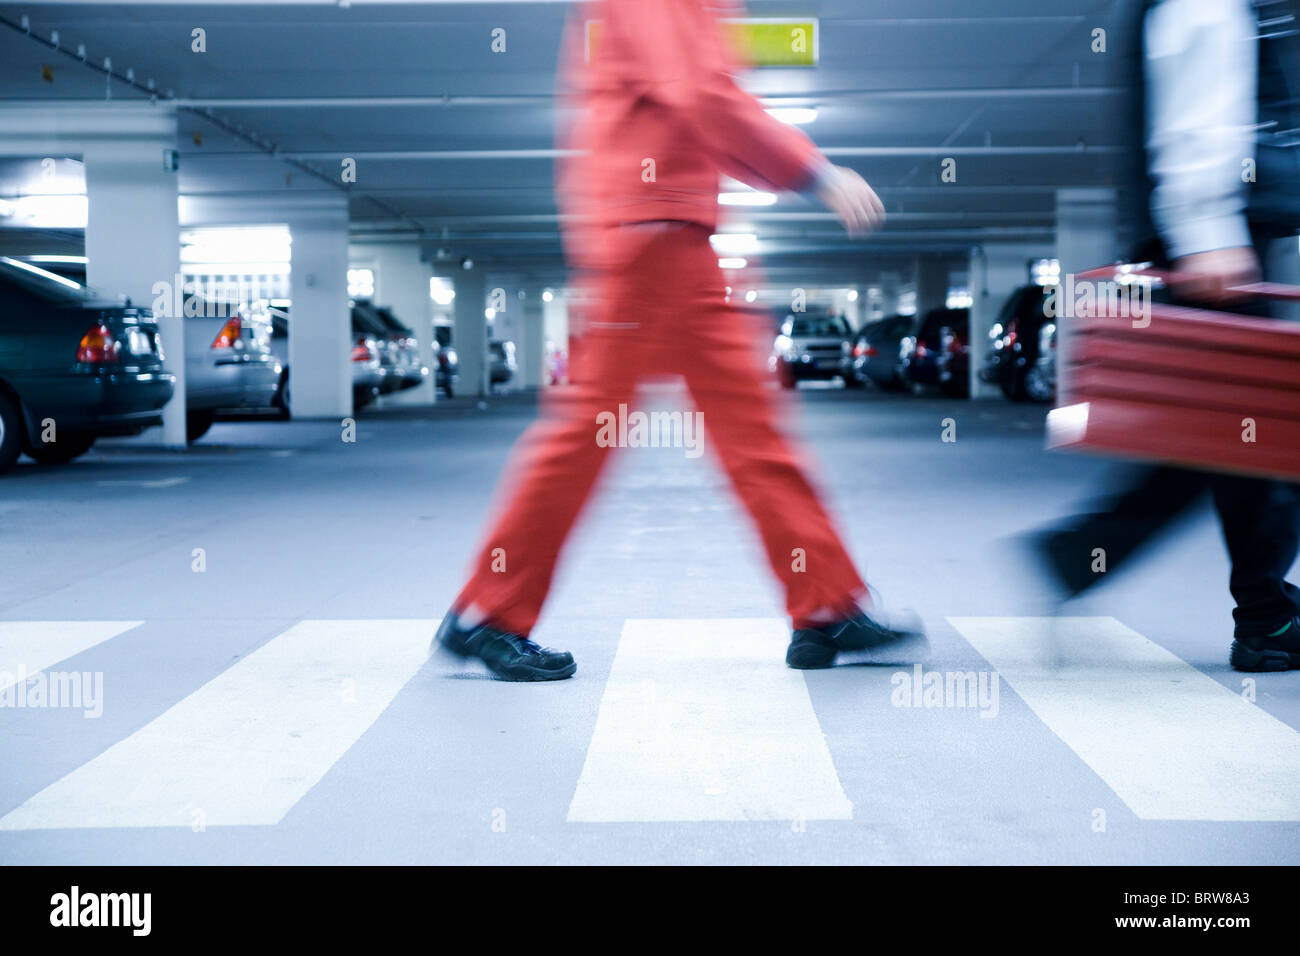 Workmen on a zebra-crossing in an underground carpark - Stock Image